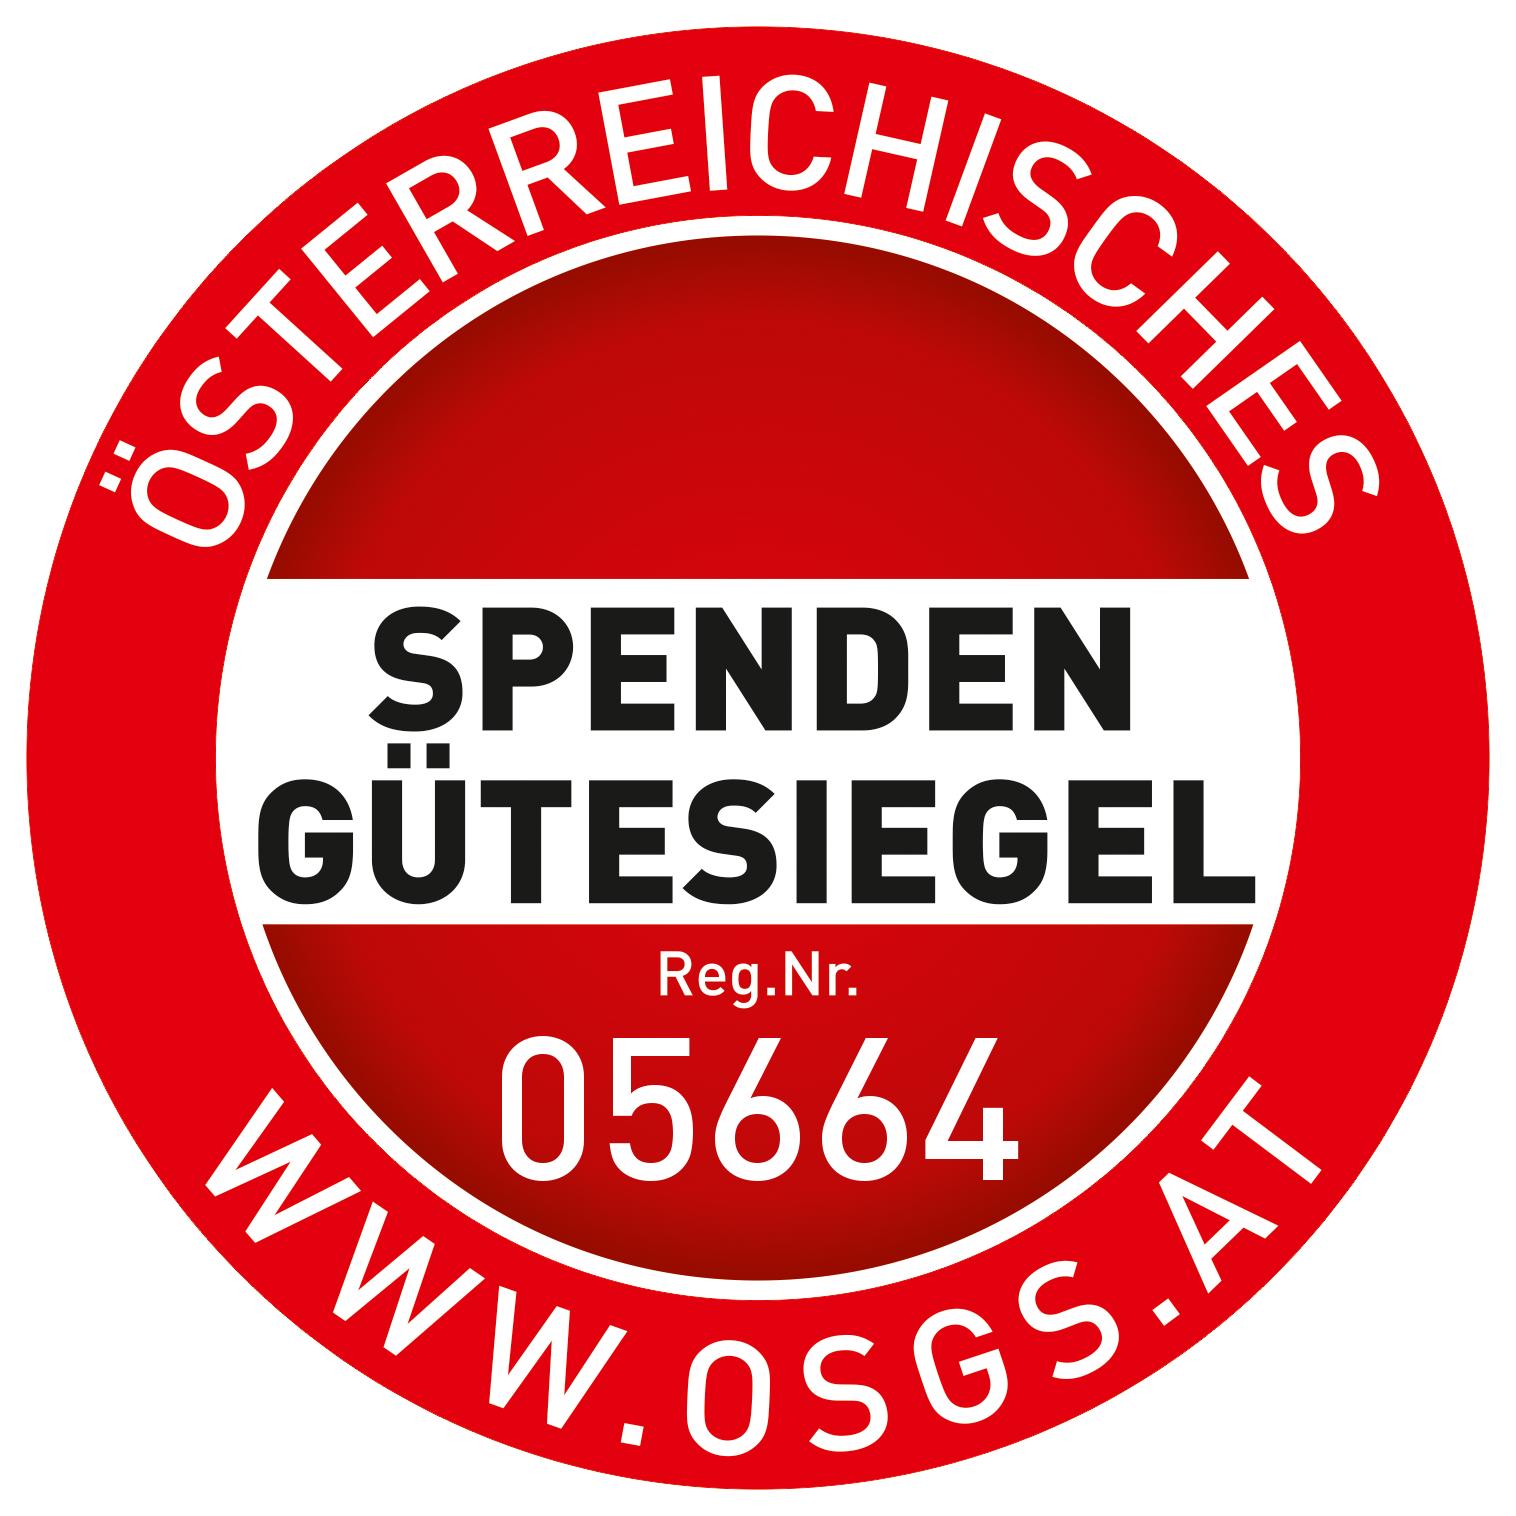 Spendengütesiegel Reg.Nr. 05664